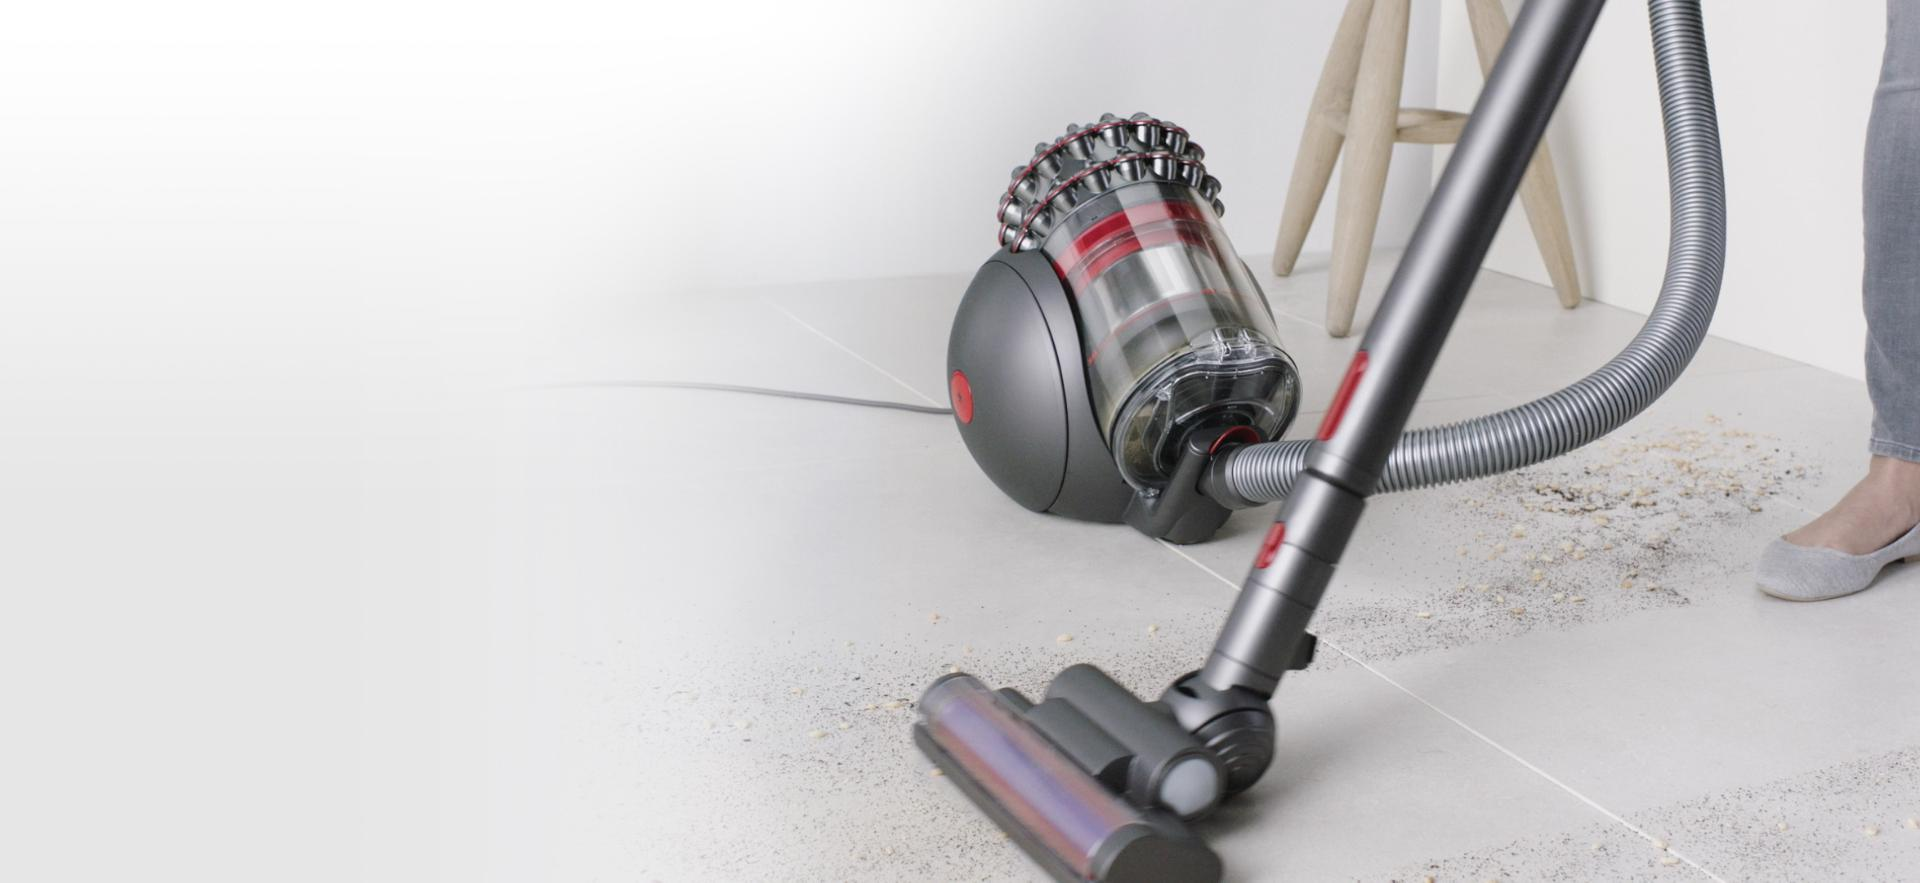 Dyson cylinder vacuum on hardfloor